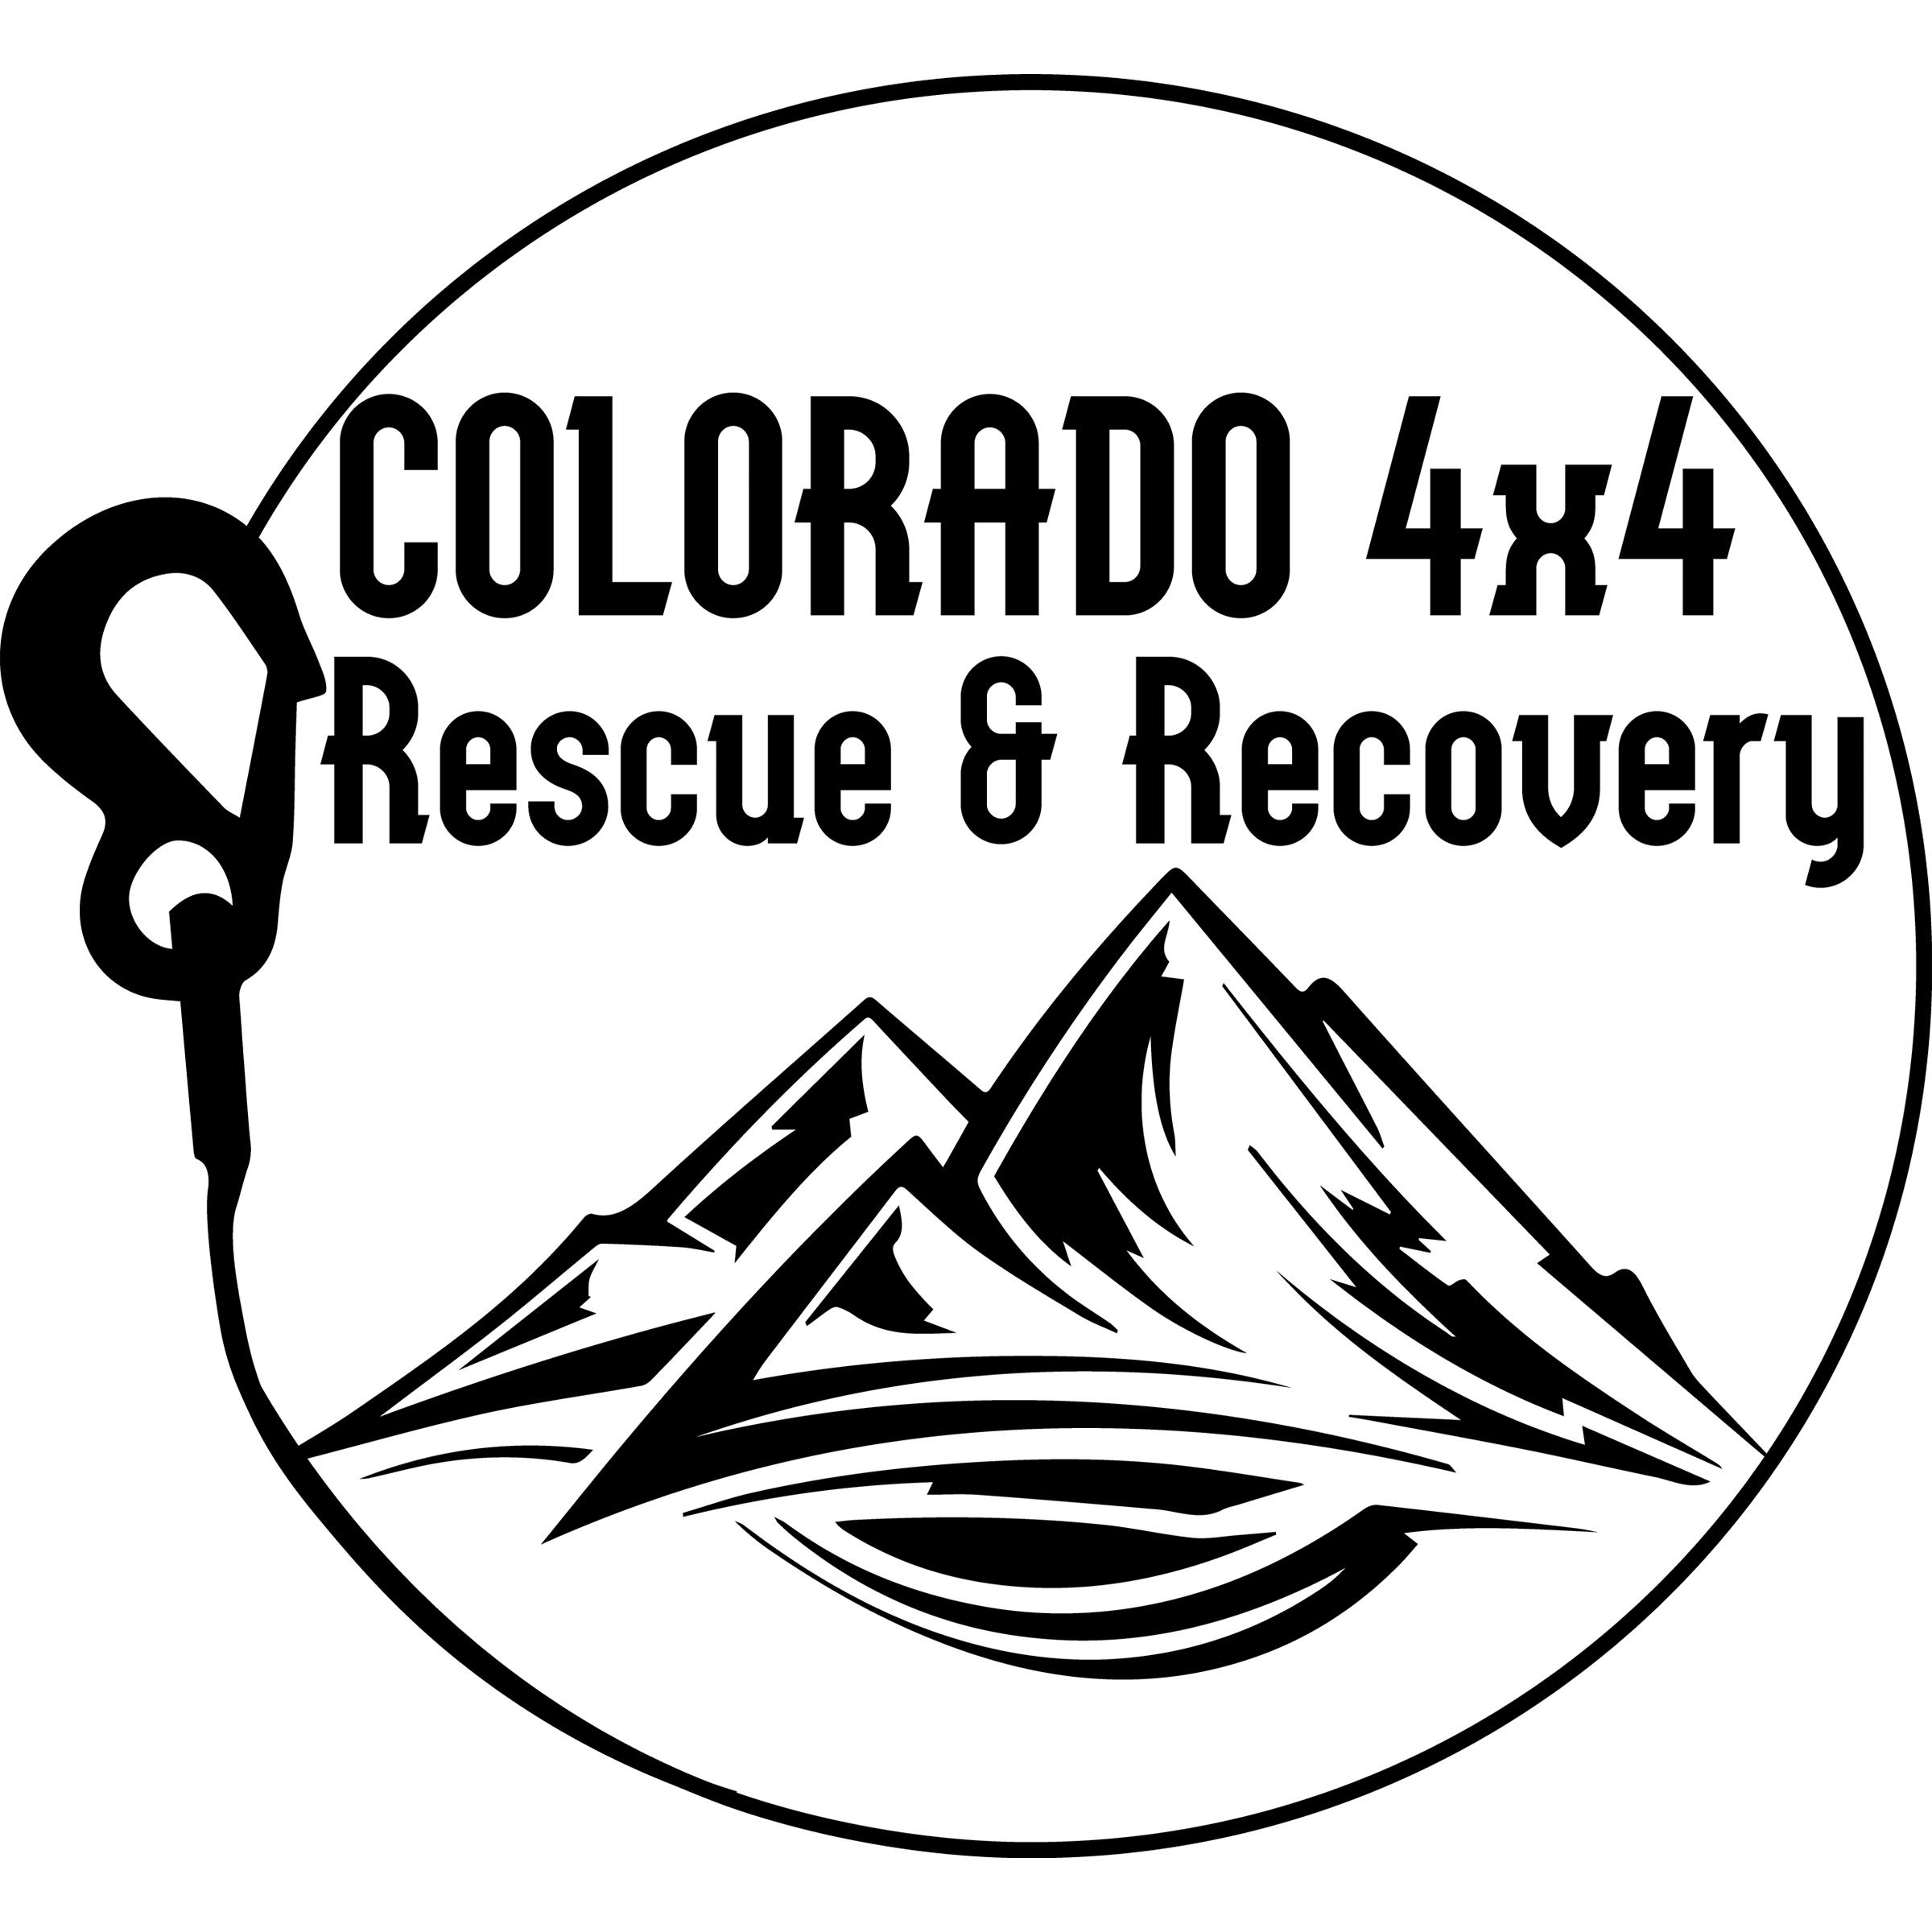 Communications - Colorado 4x4 Rescue & Recovery